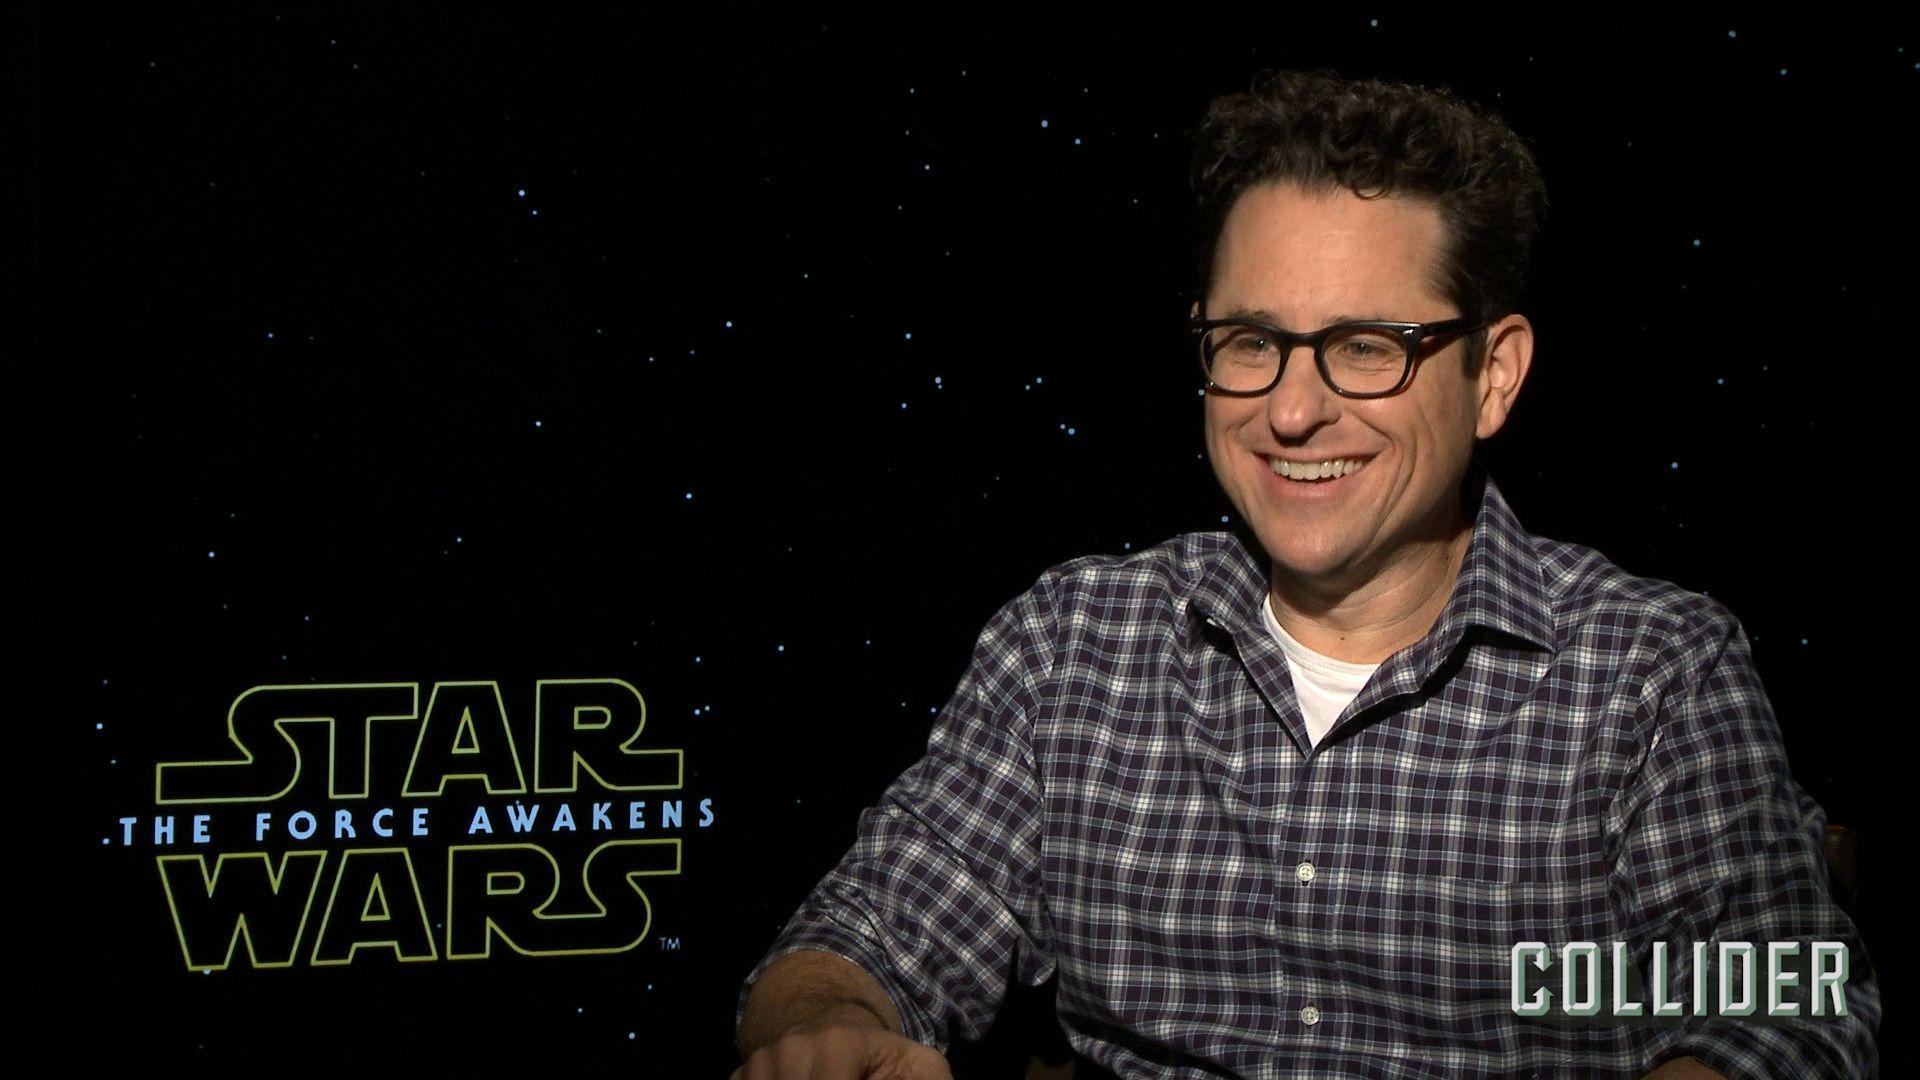 jj abrams on star wars  the force awakens deleted scenes